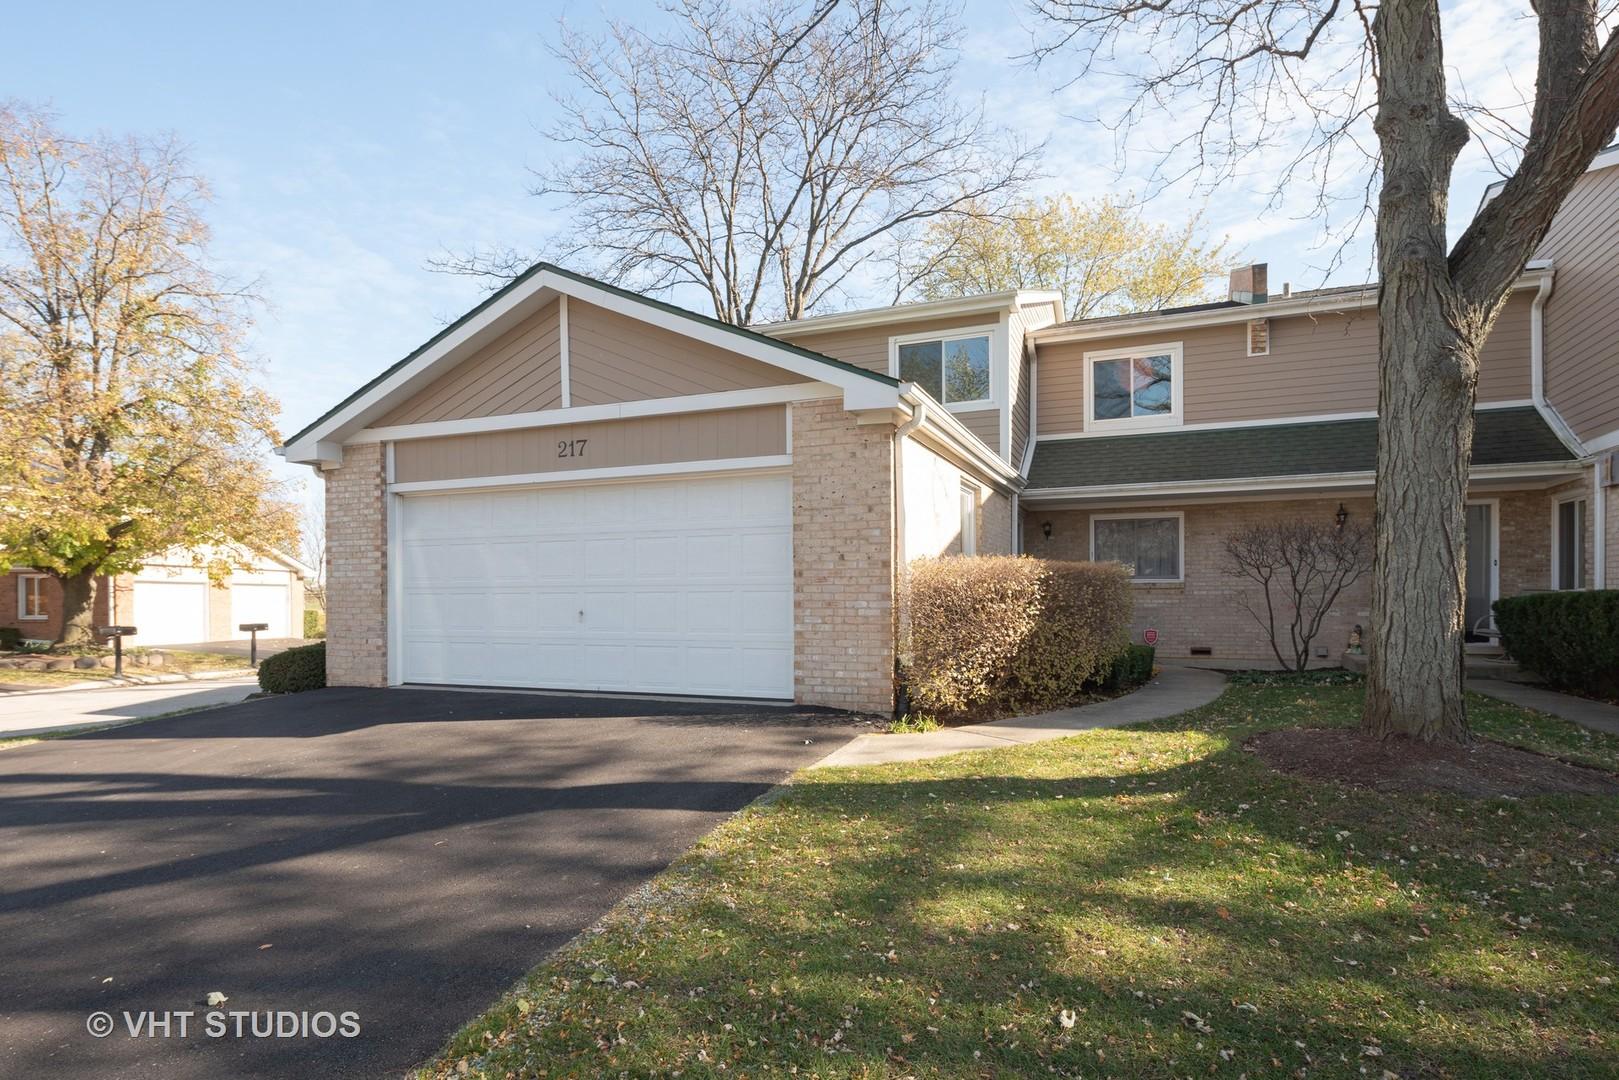 217 Golfview ,Palatine, Illinois 60067